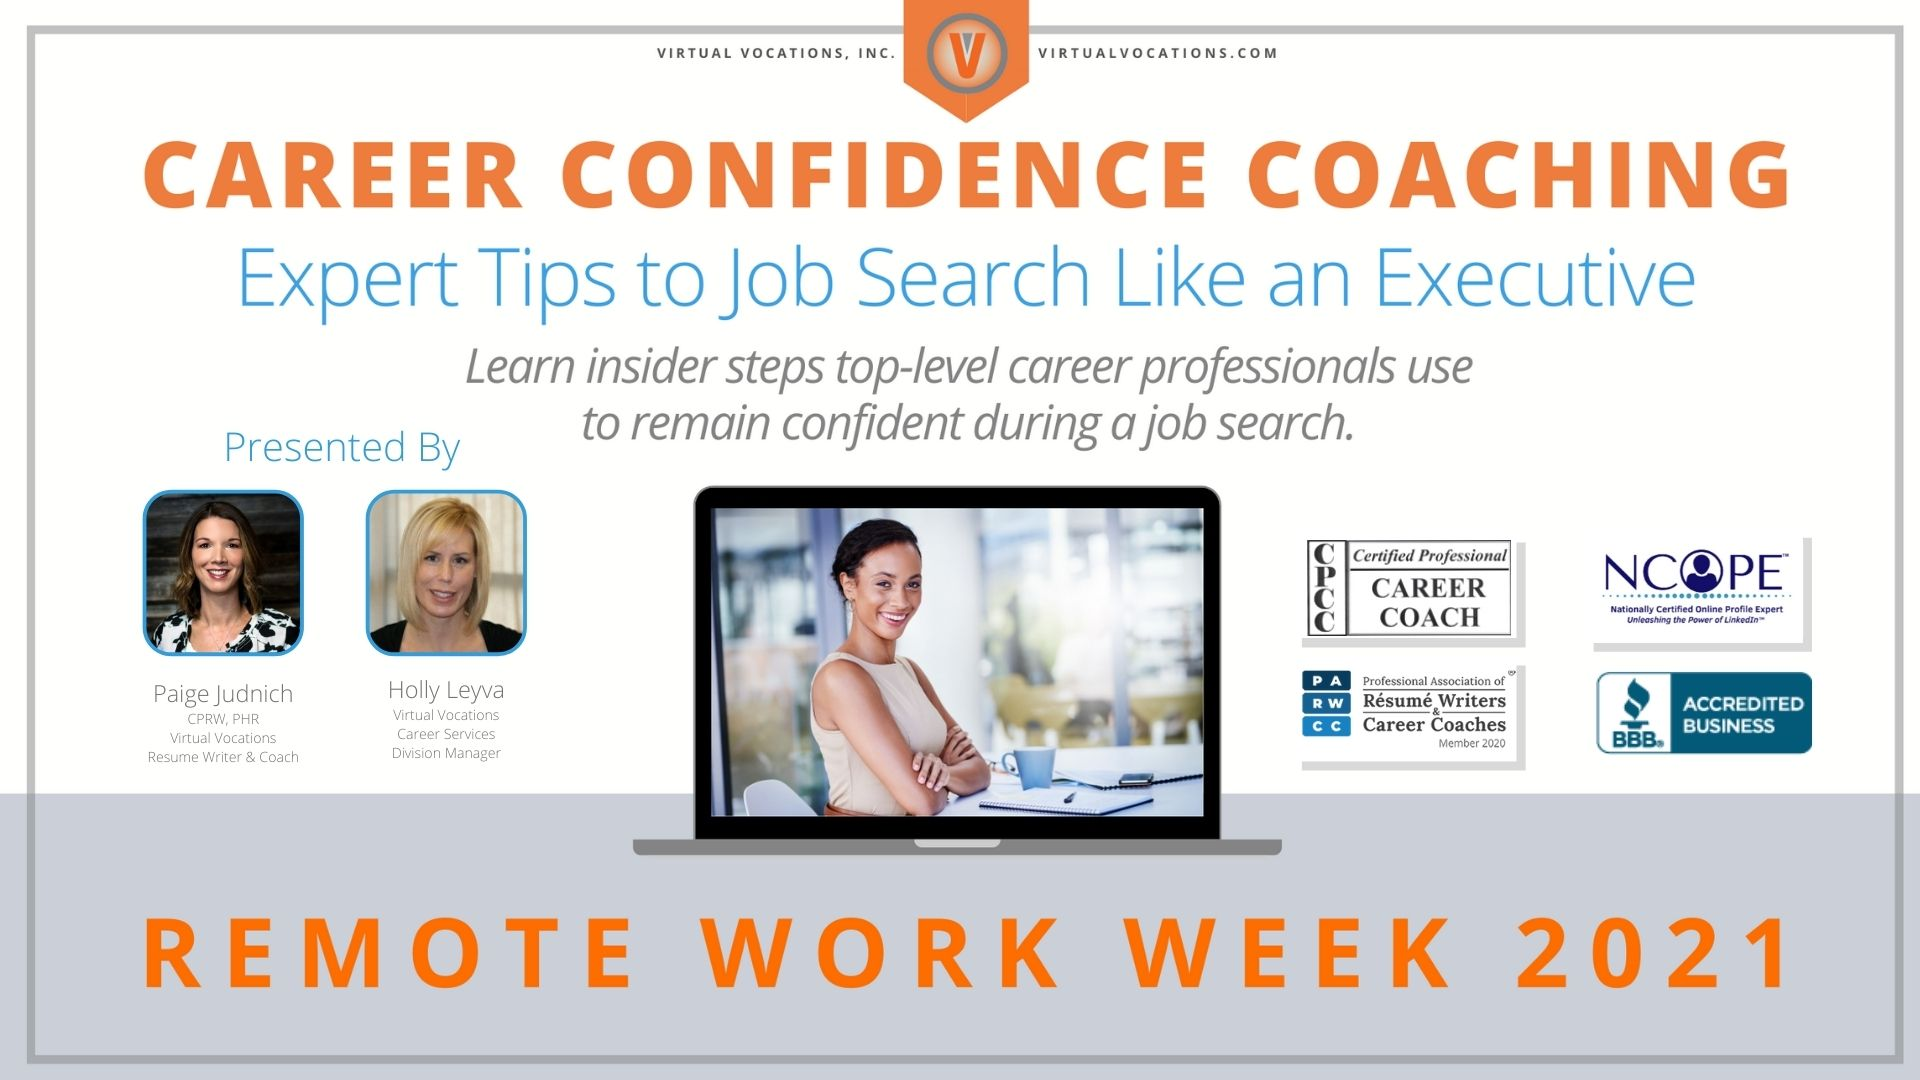 Expert Tips to Job Search Like an Executive